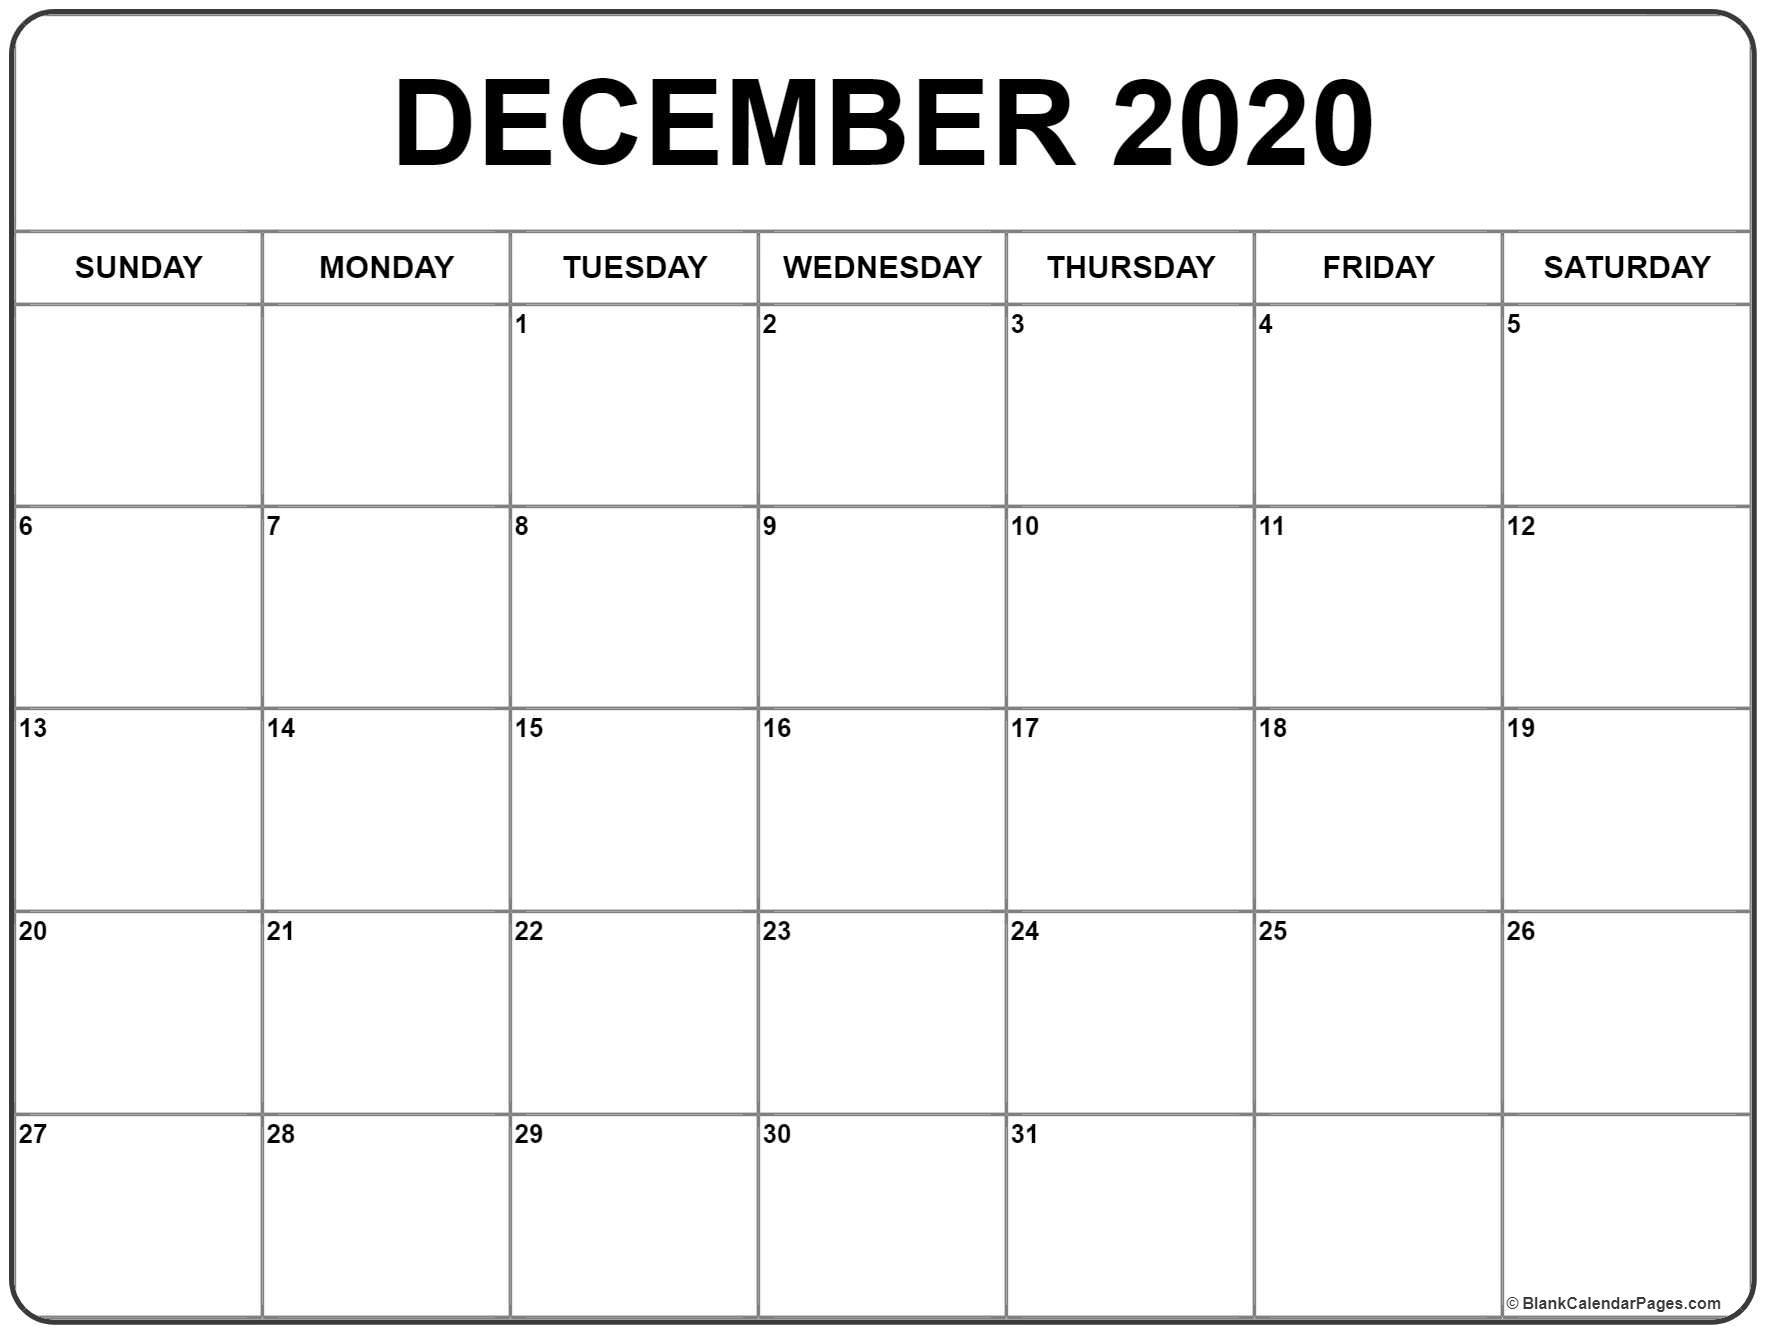 December 2020 Calendar | Free Printable Monthly Calendars_Calendar Blank December 2020